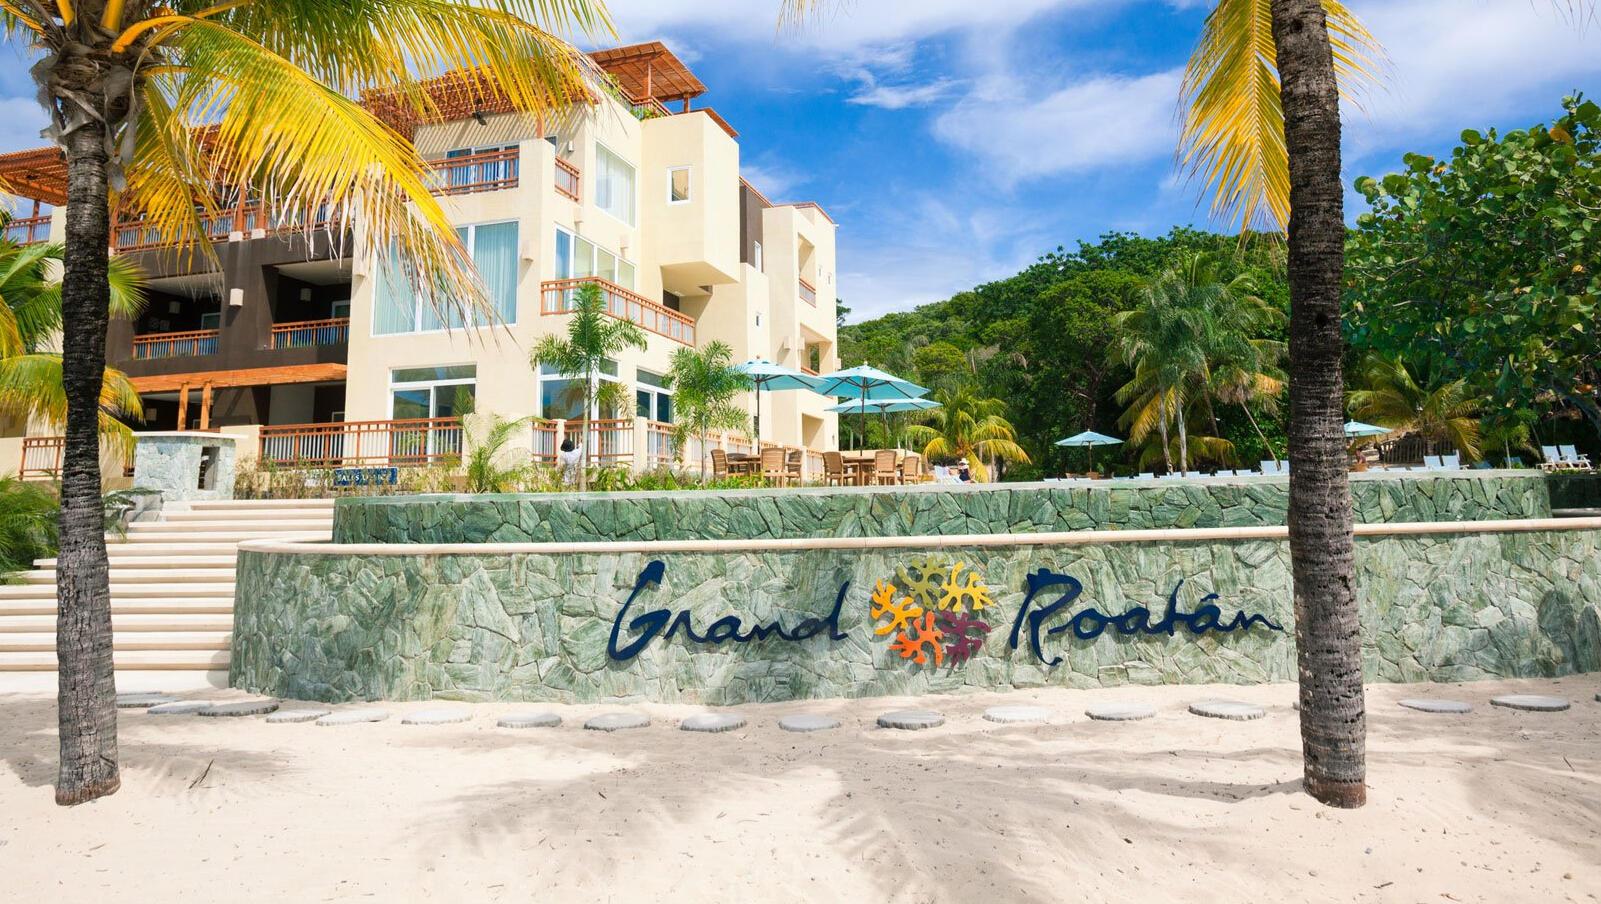 hotel on the beach with grand roatan logo